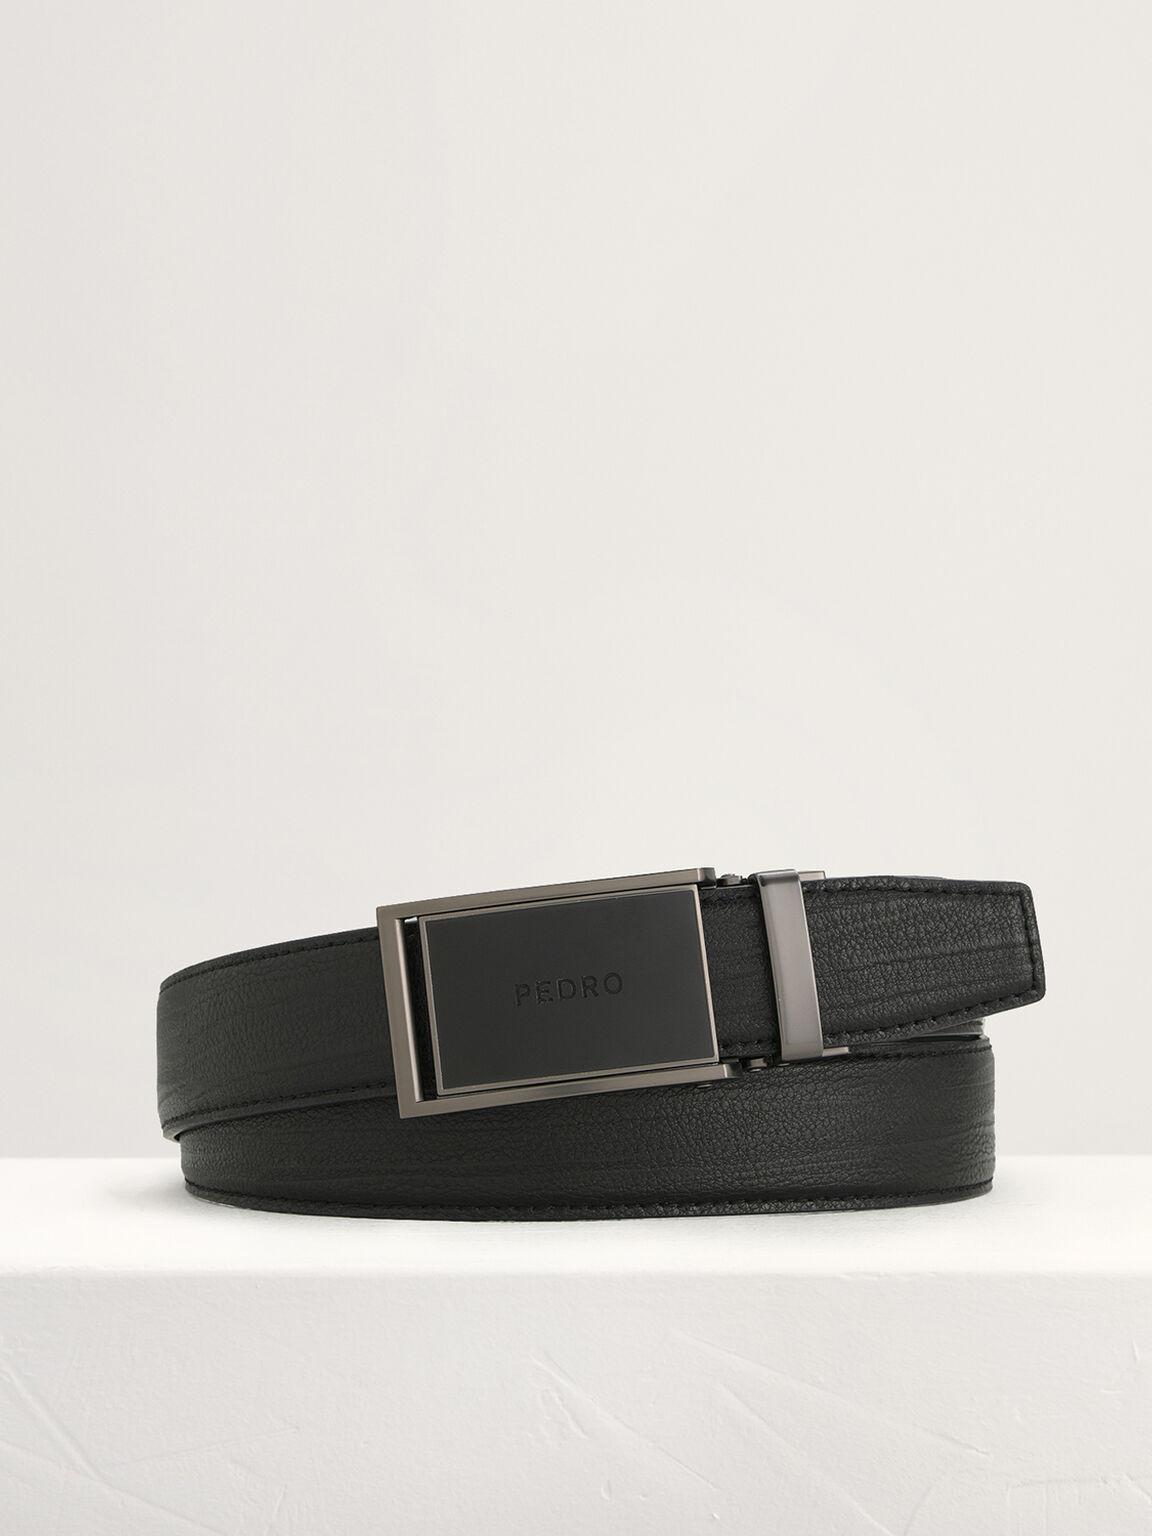 Leather Automatic Buckle Belt, Black, hi-res